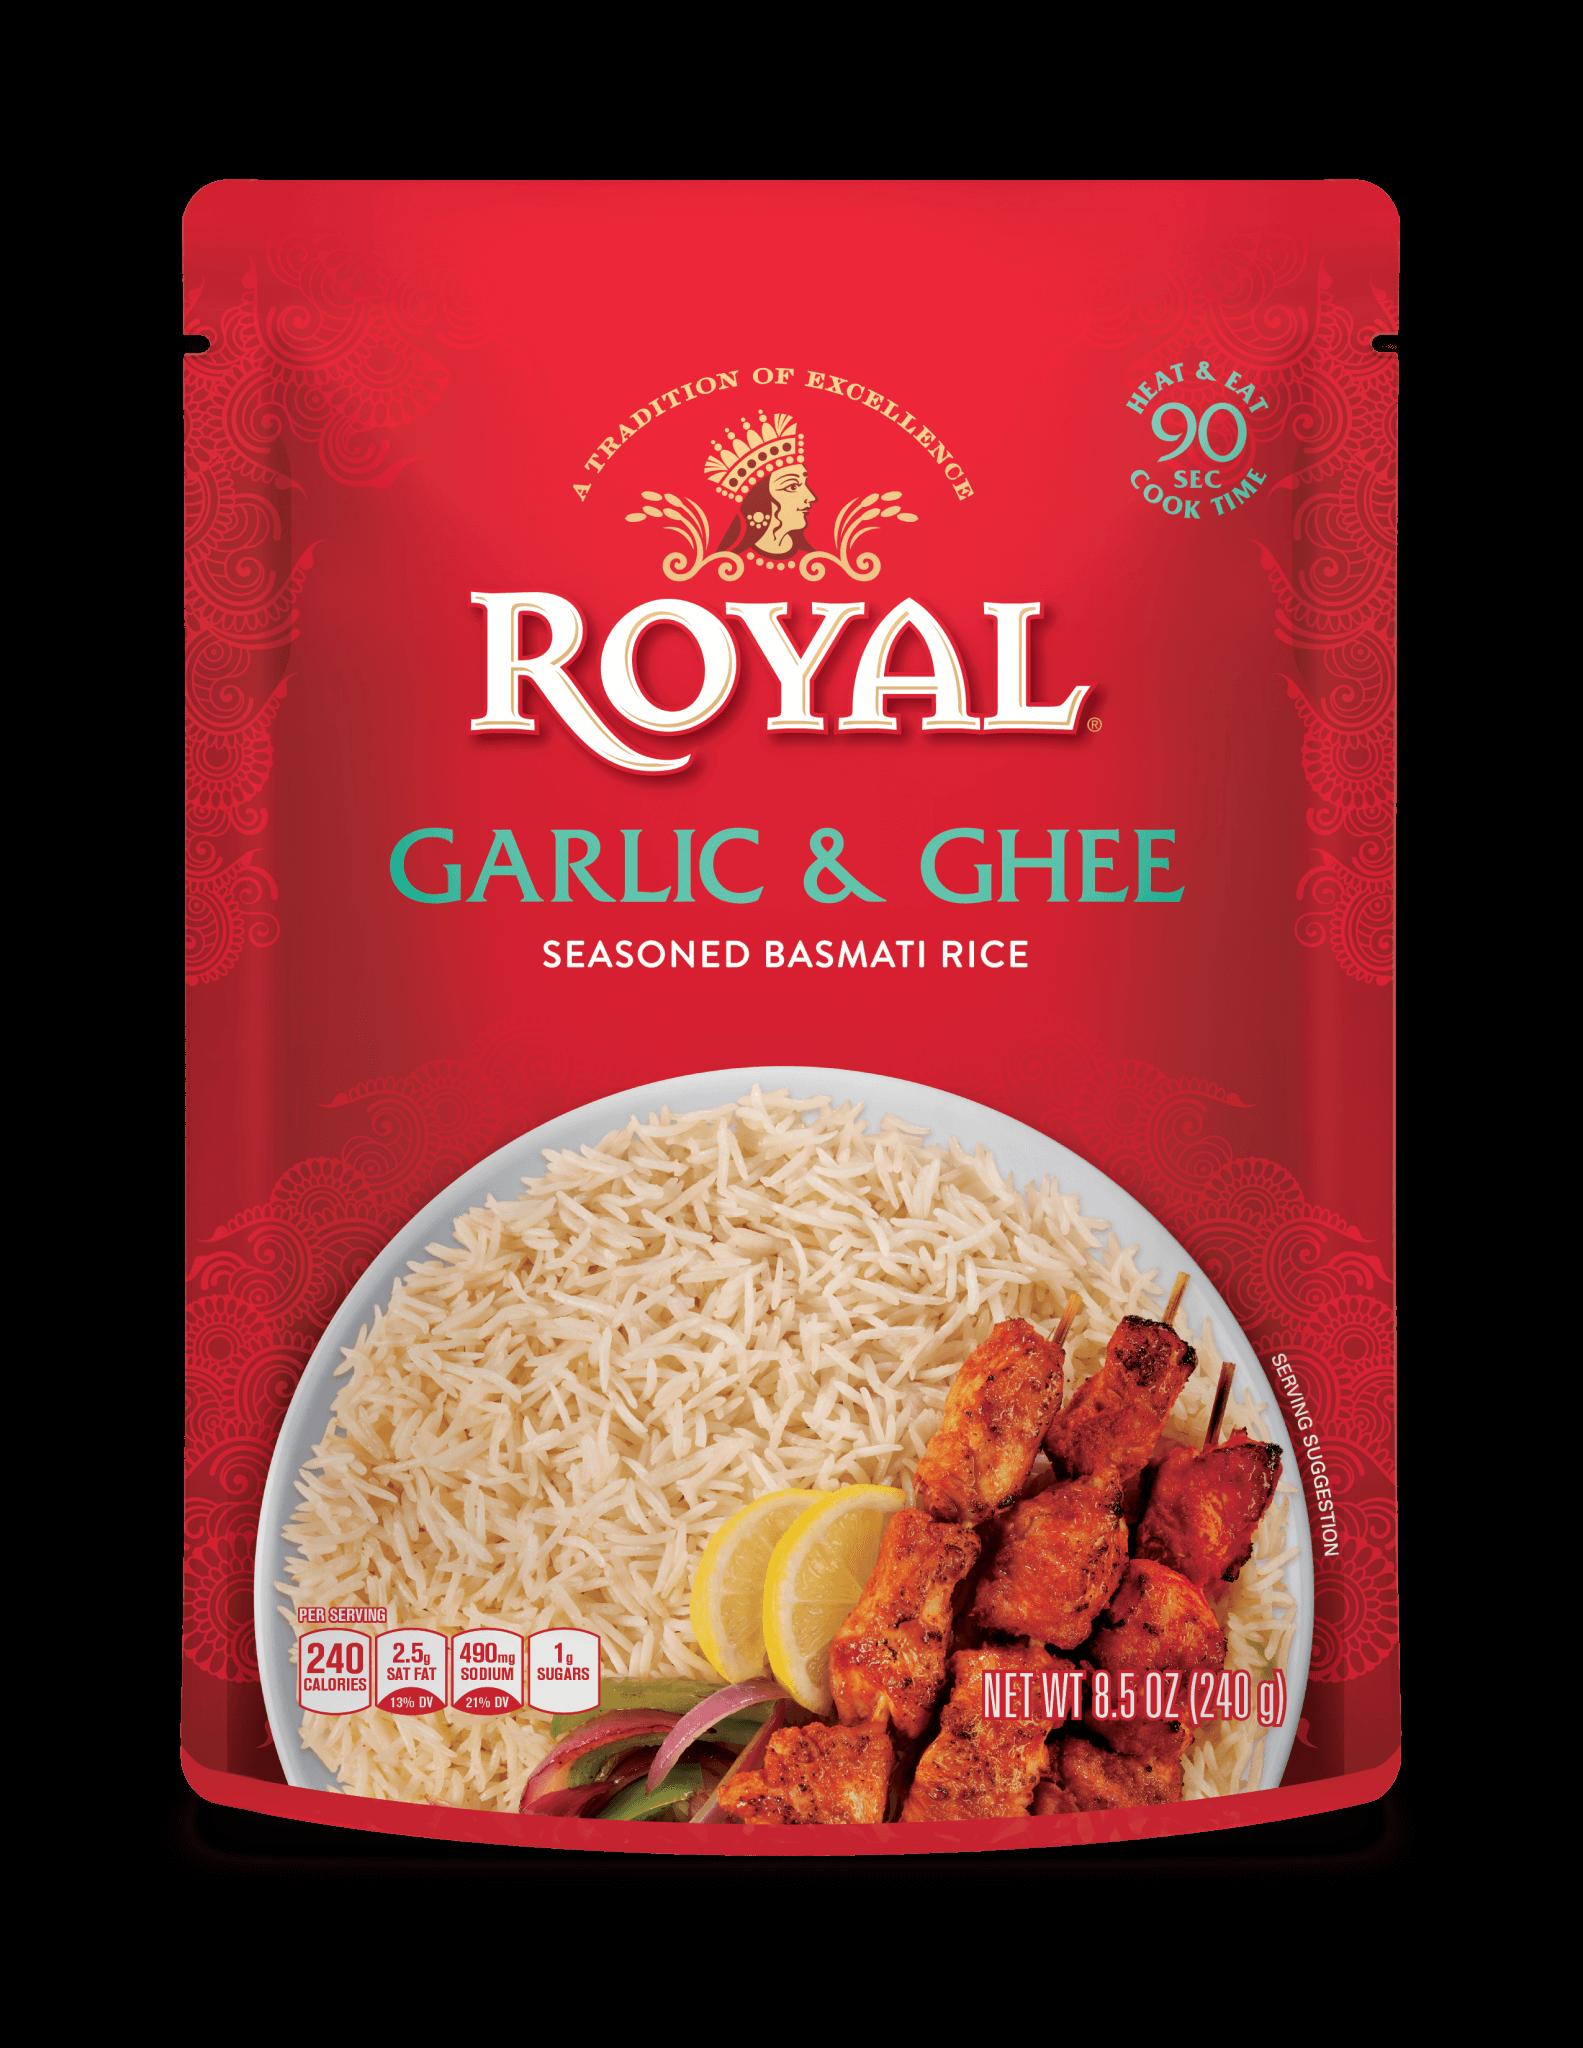 Garlic & Ghee Seasoned  Basmati Rice